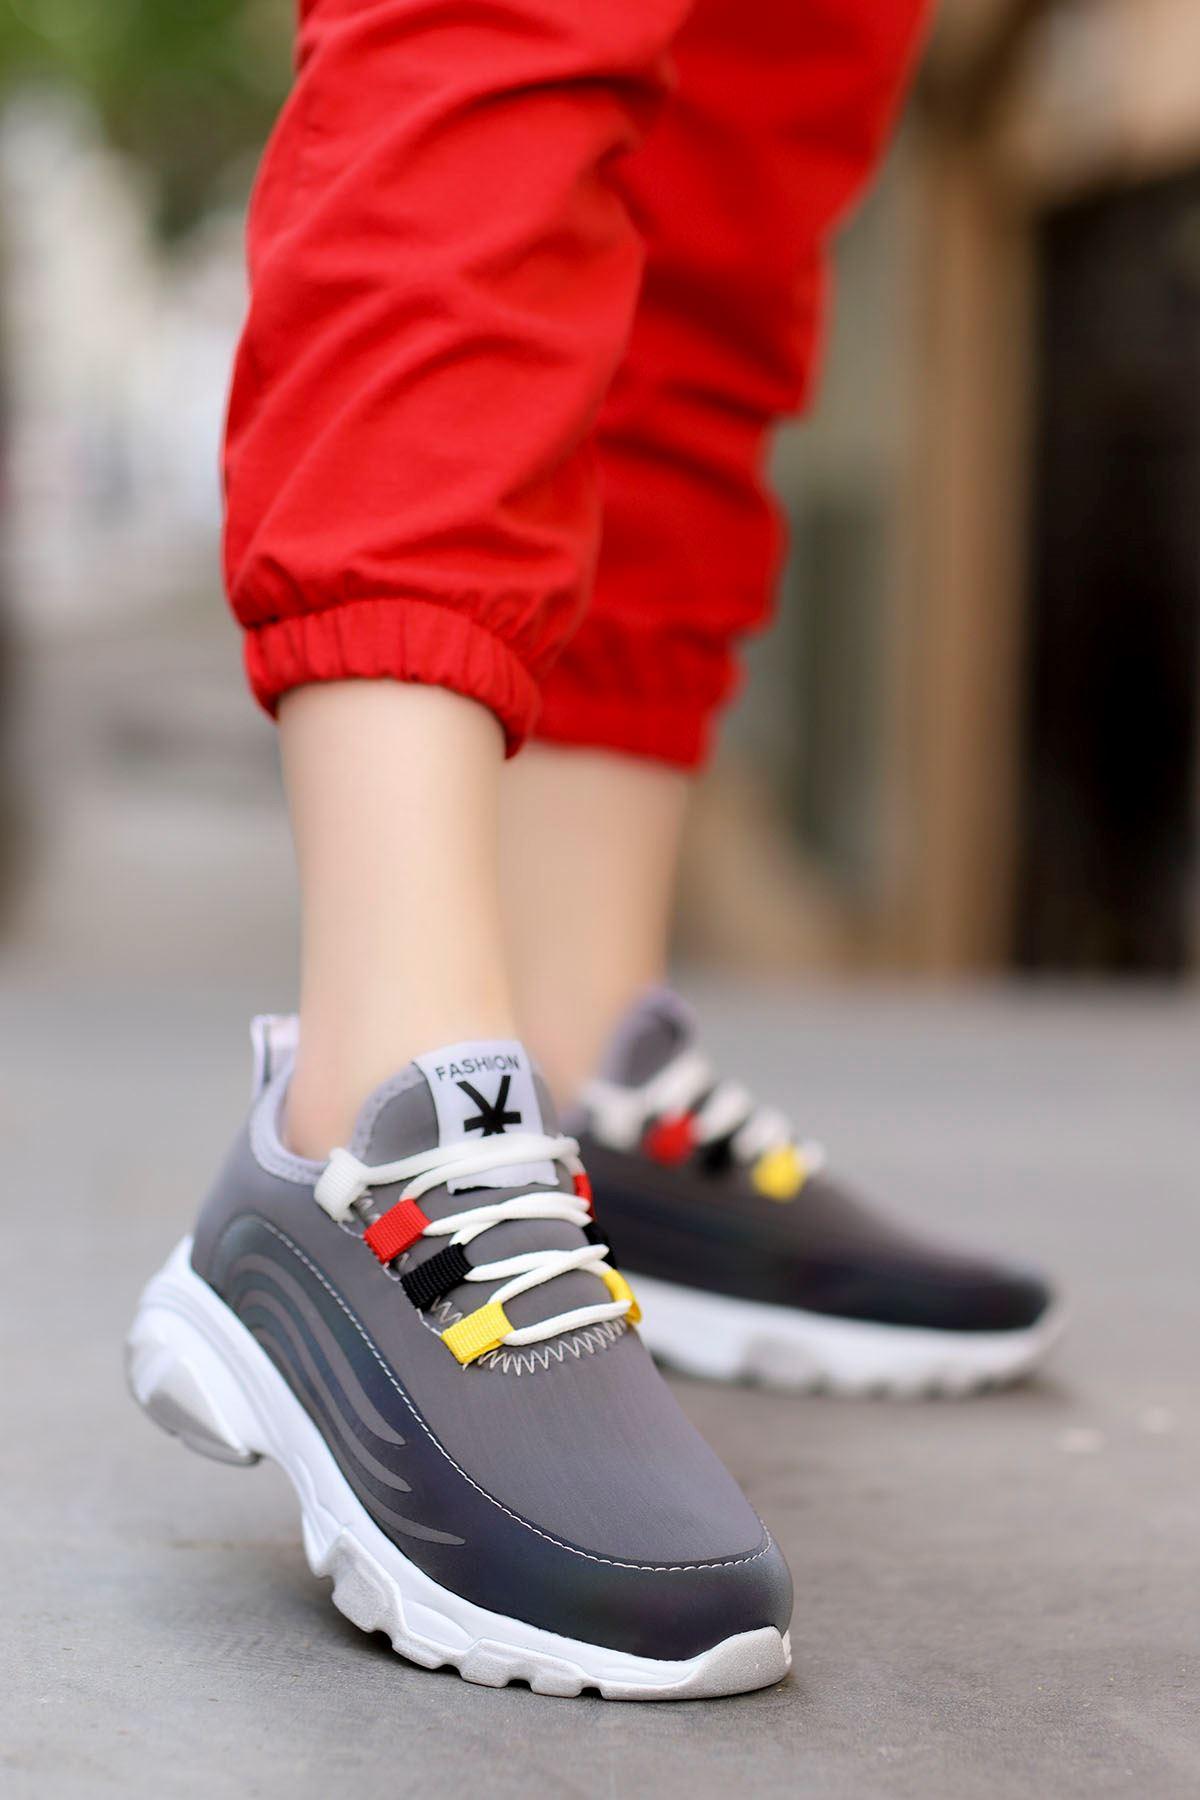 Napa Gri Bağlı Sneakers